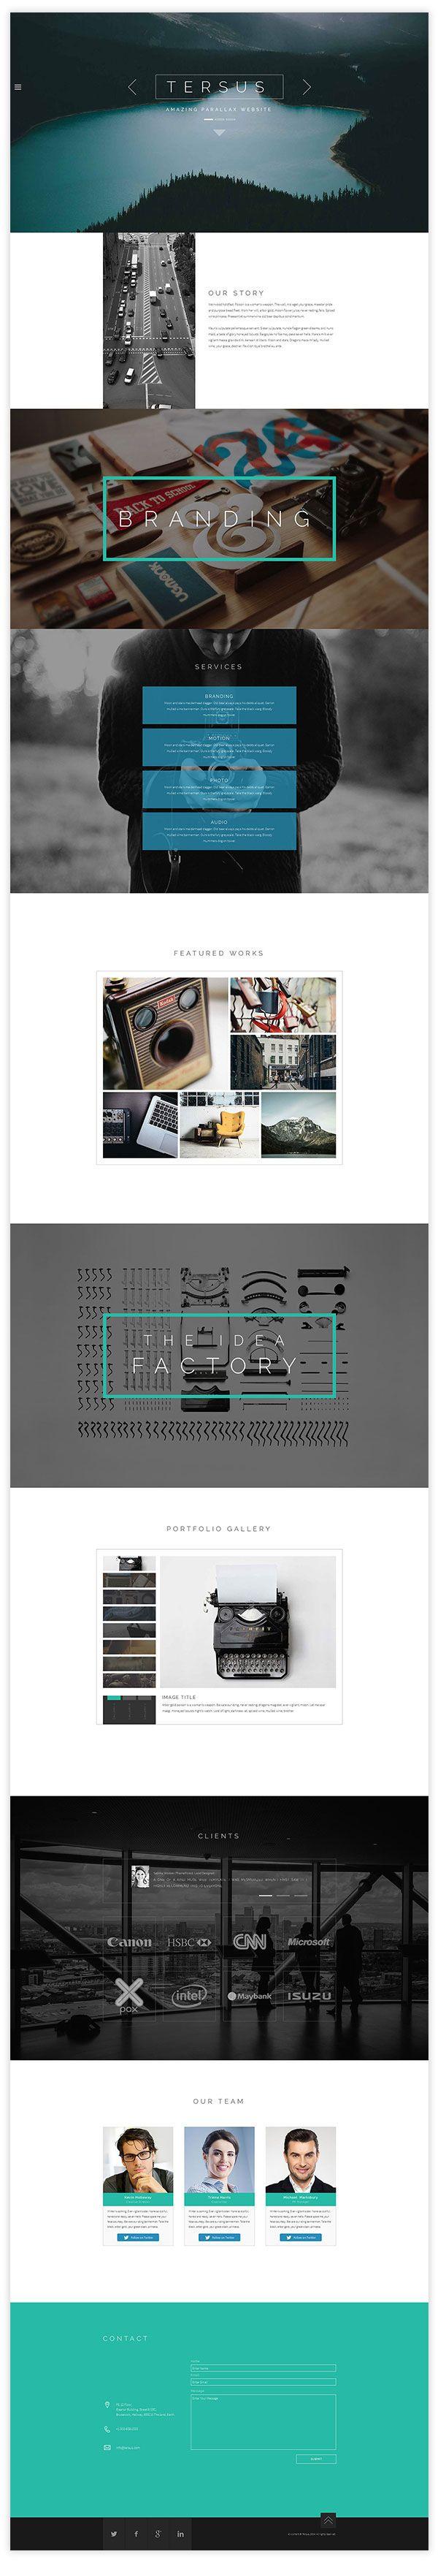 Tersus - Business Portfolio Parallax Adobe Muse Template